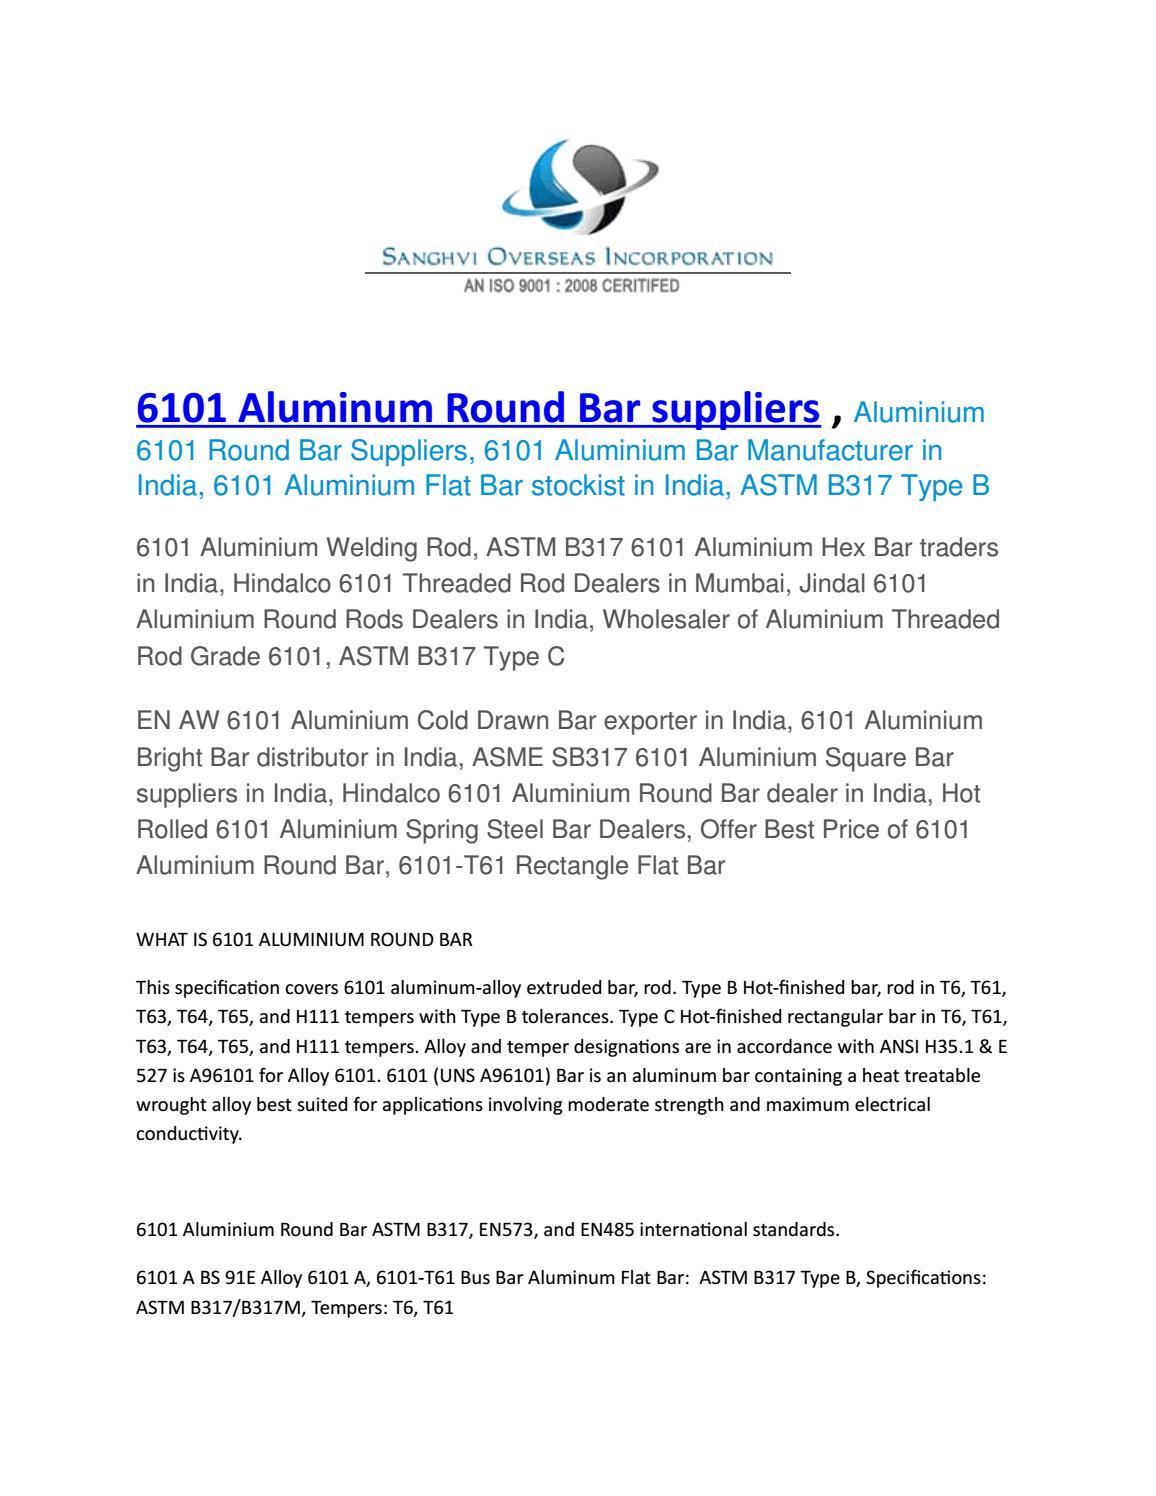 6101 aluminum round bar suppliers by sanghvioverseasinc - issuu